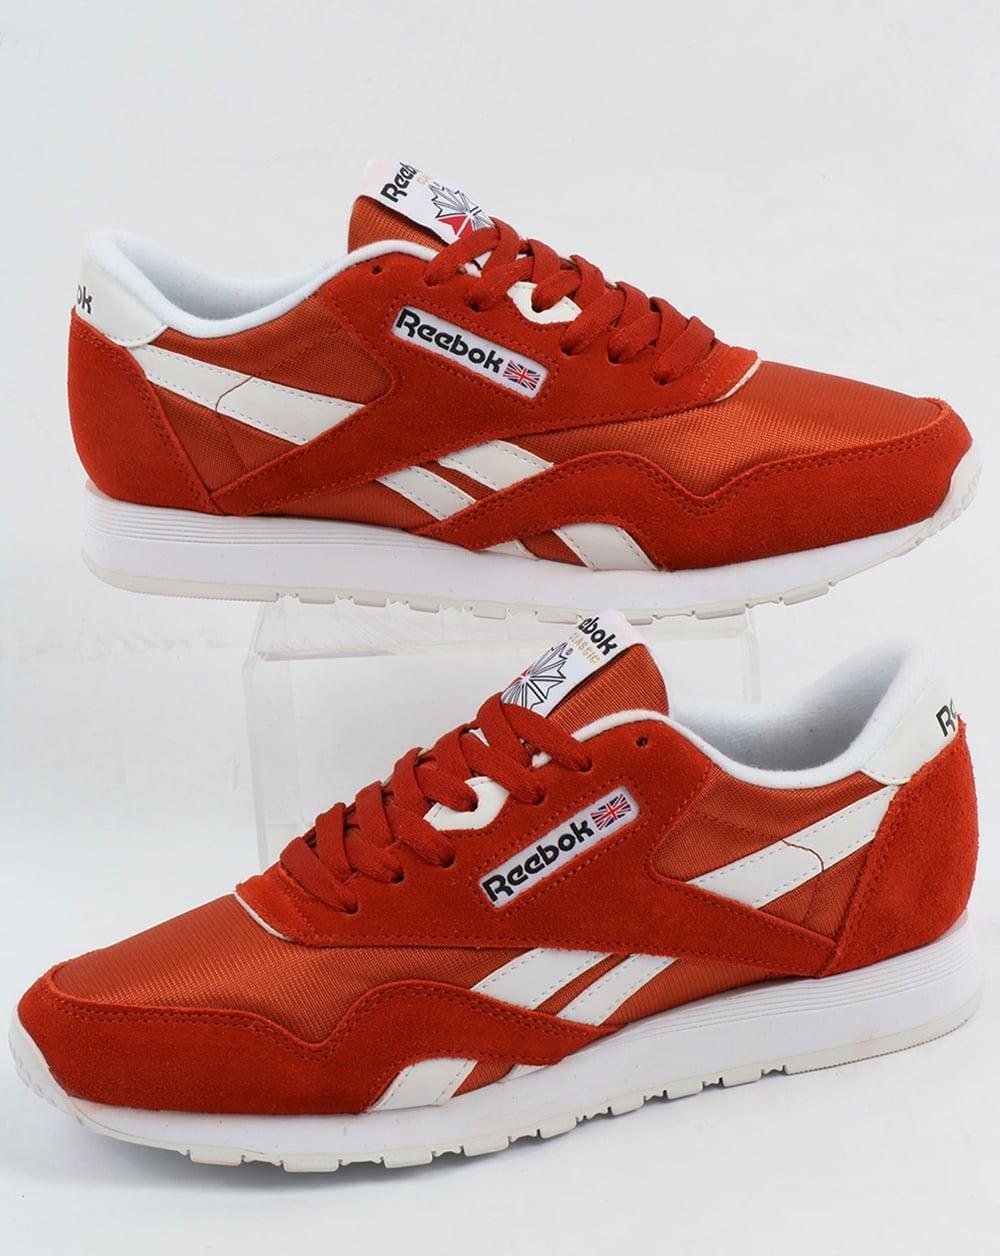 31142aaa1fcf Reebok Reebok Classic Nylon Trainers Burnt Orange